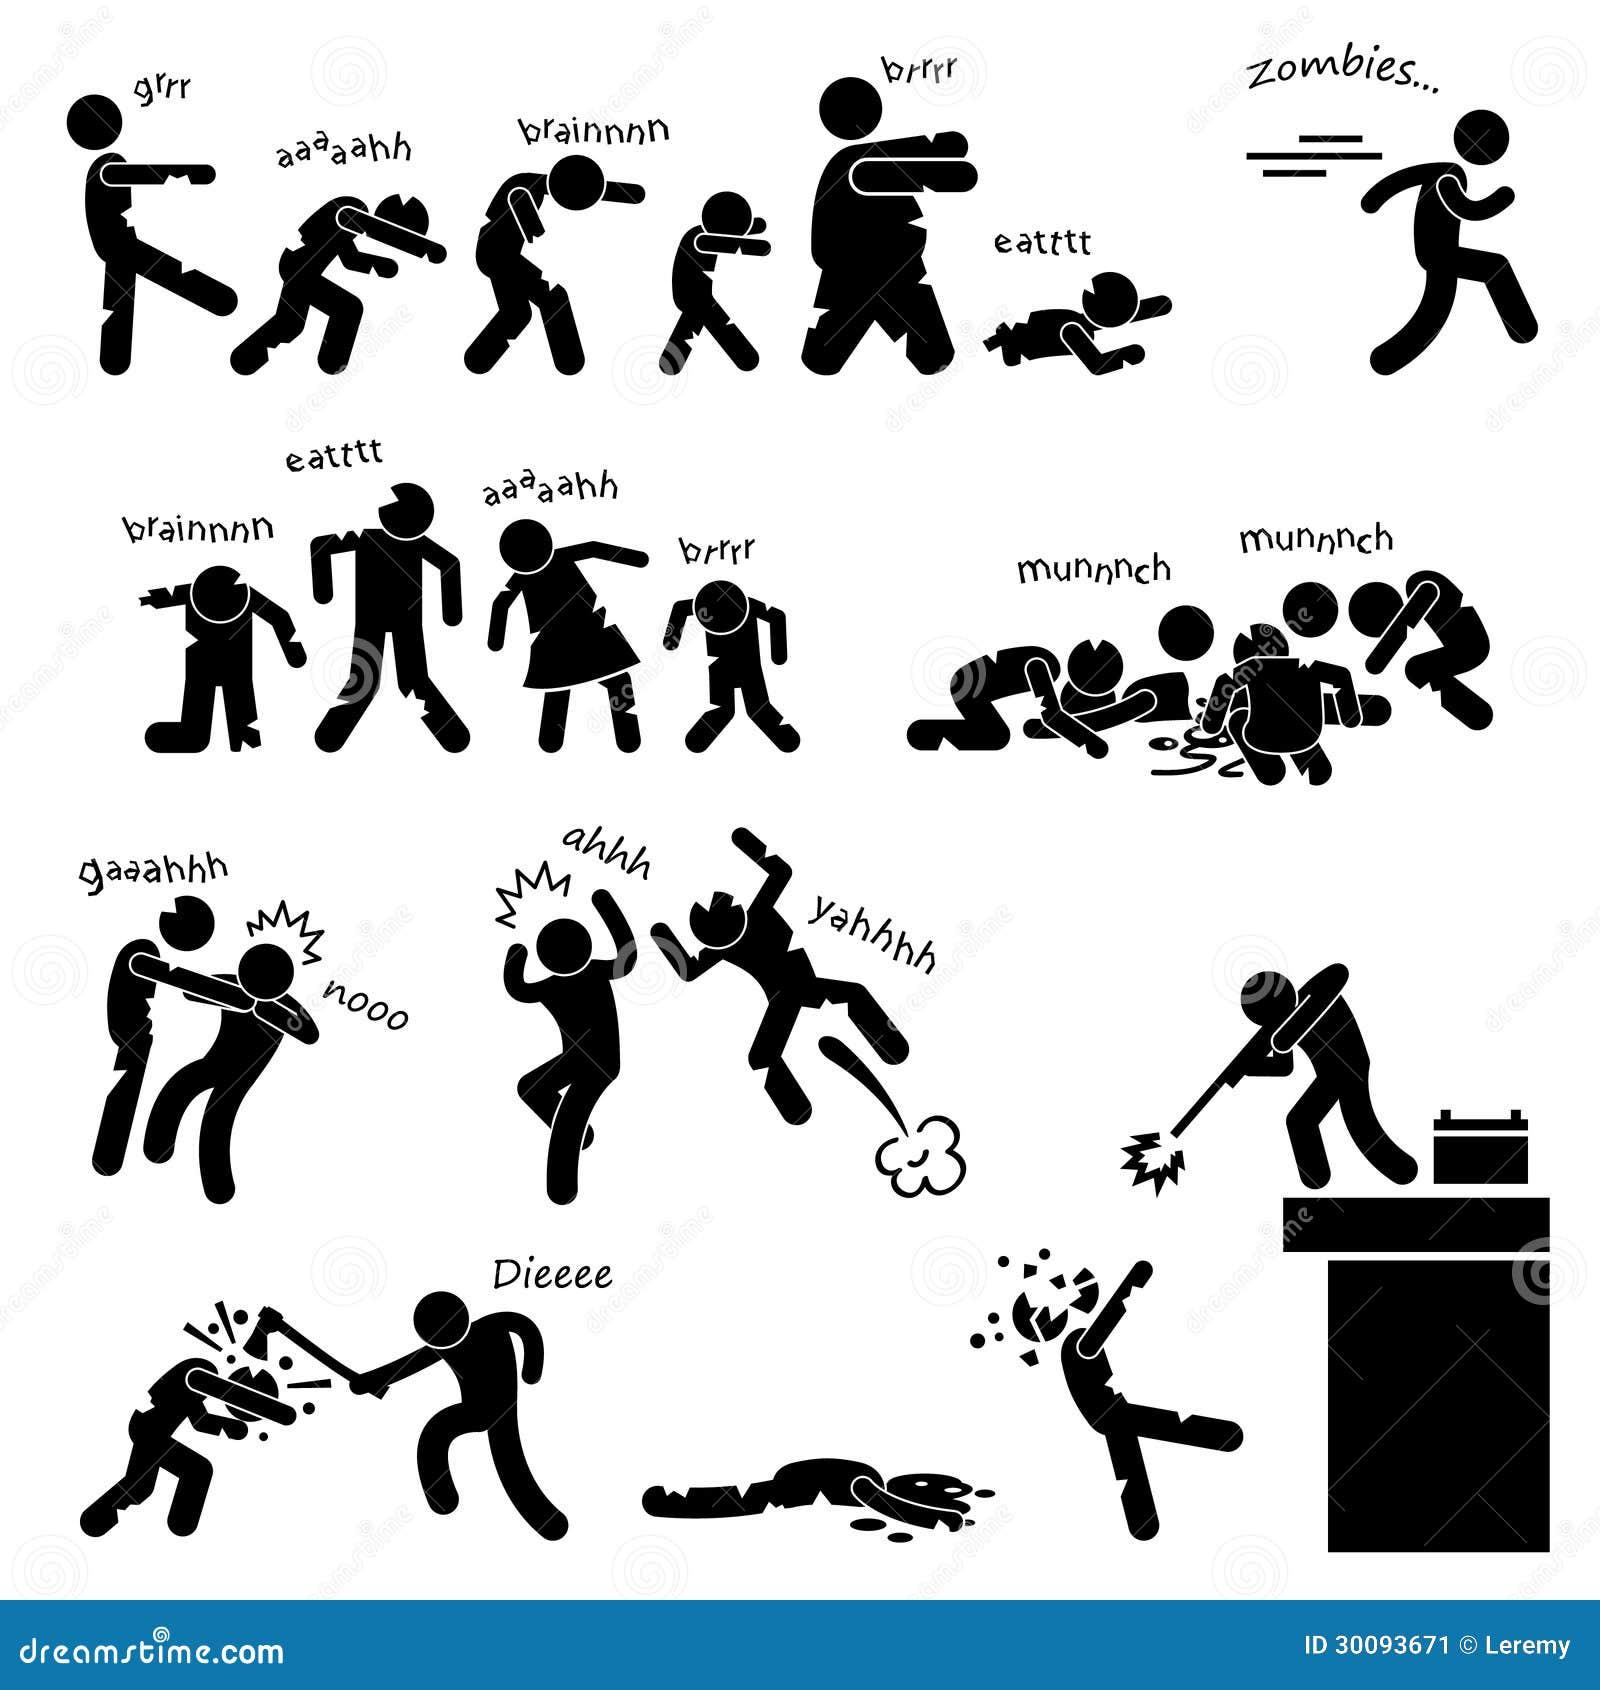 ZombieUndead anfaller pictogramen